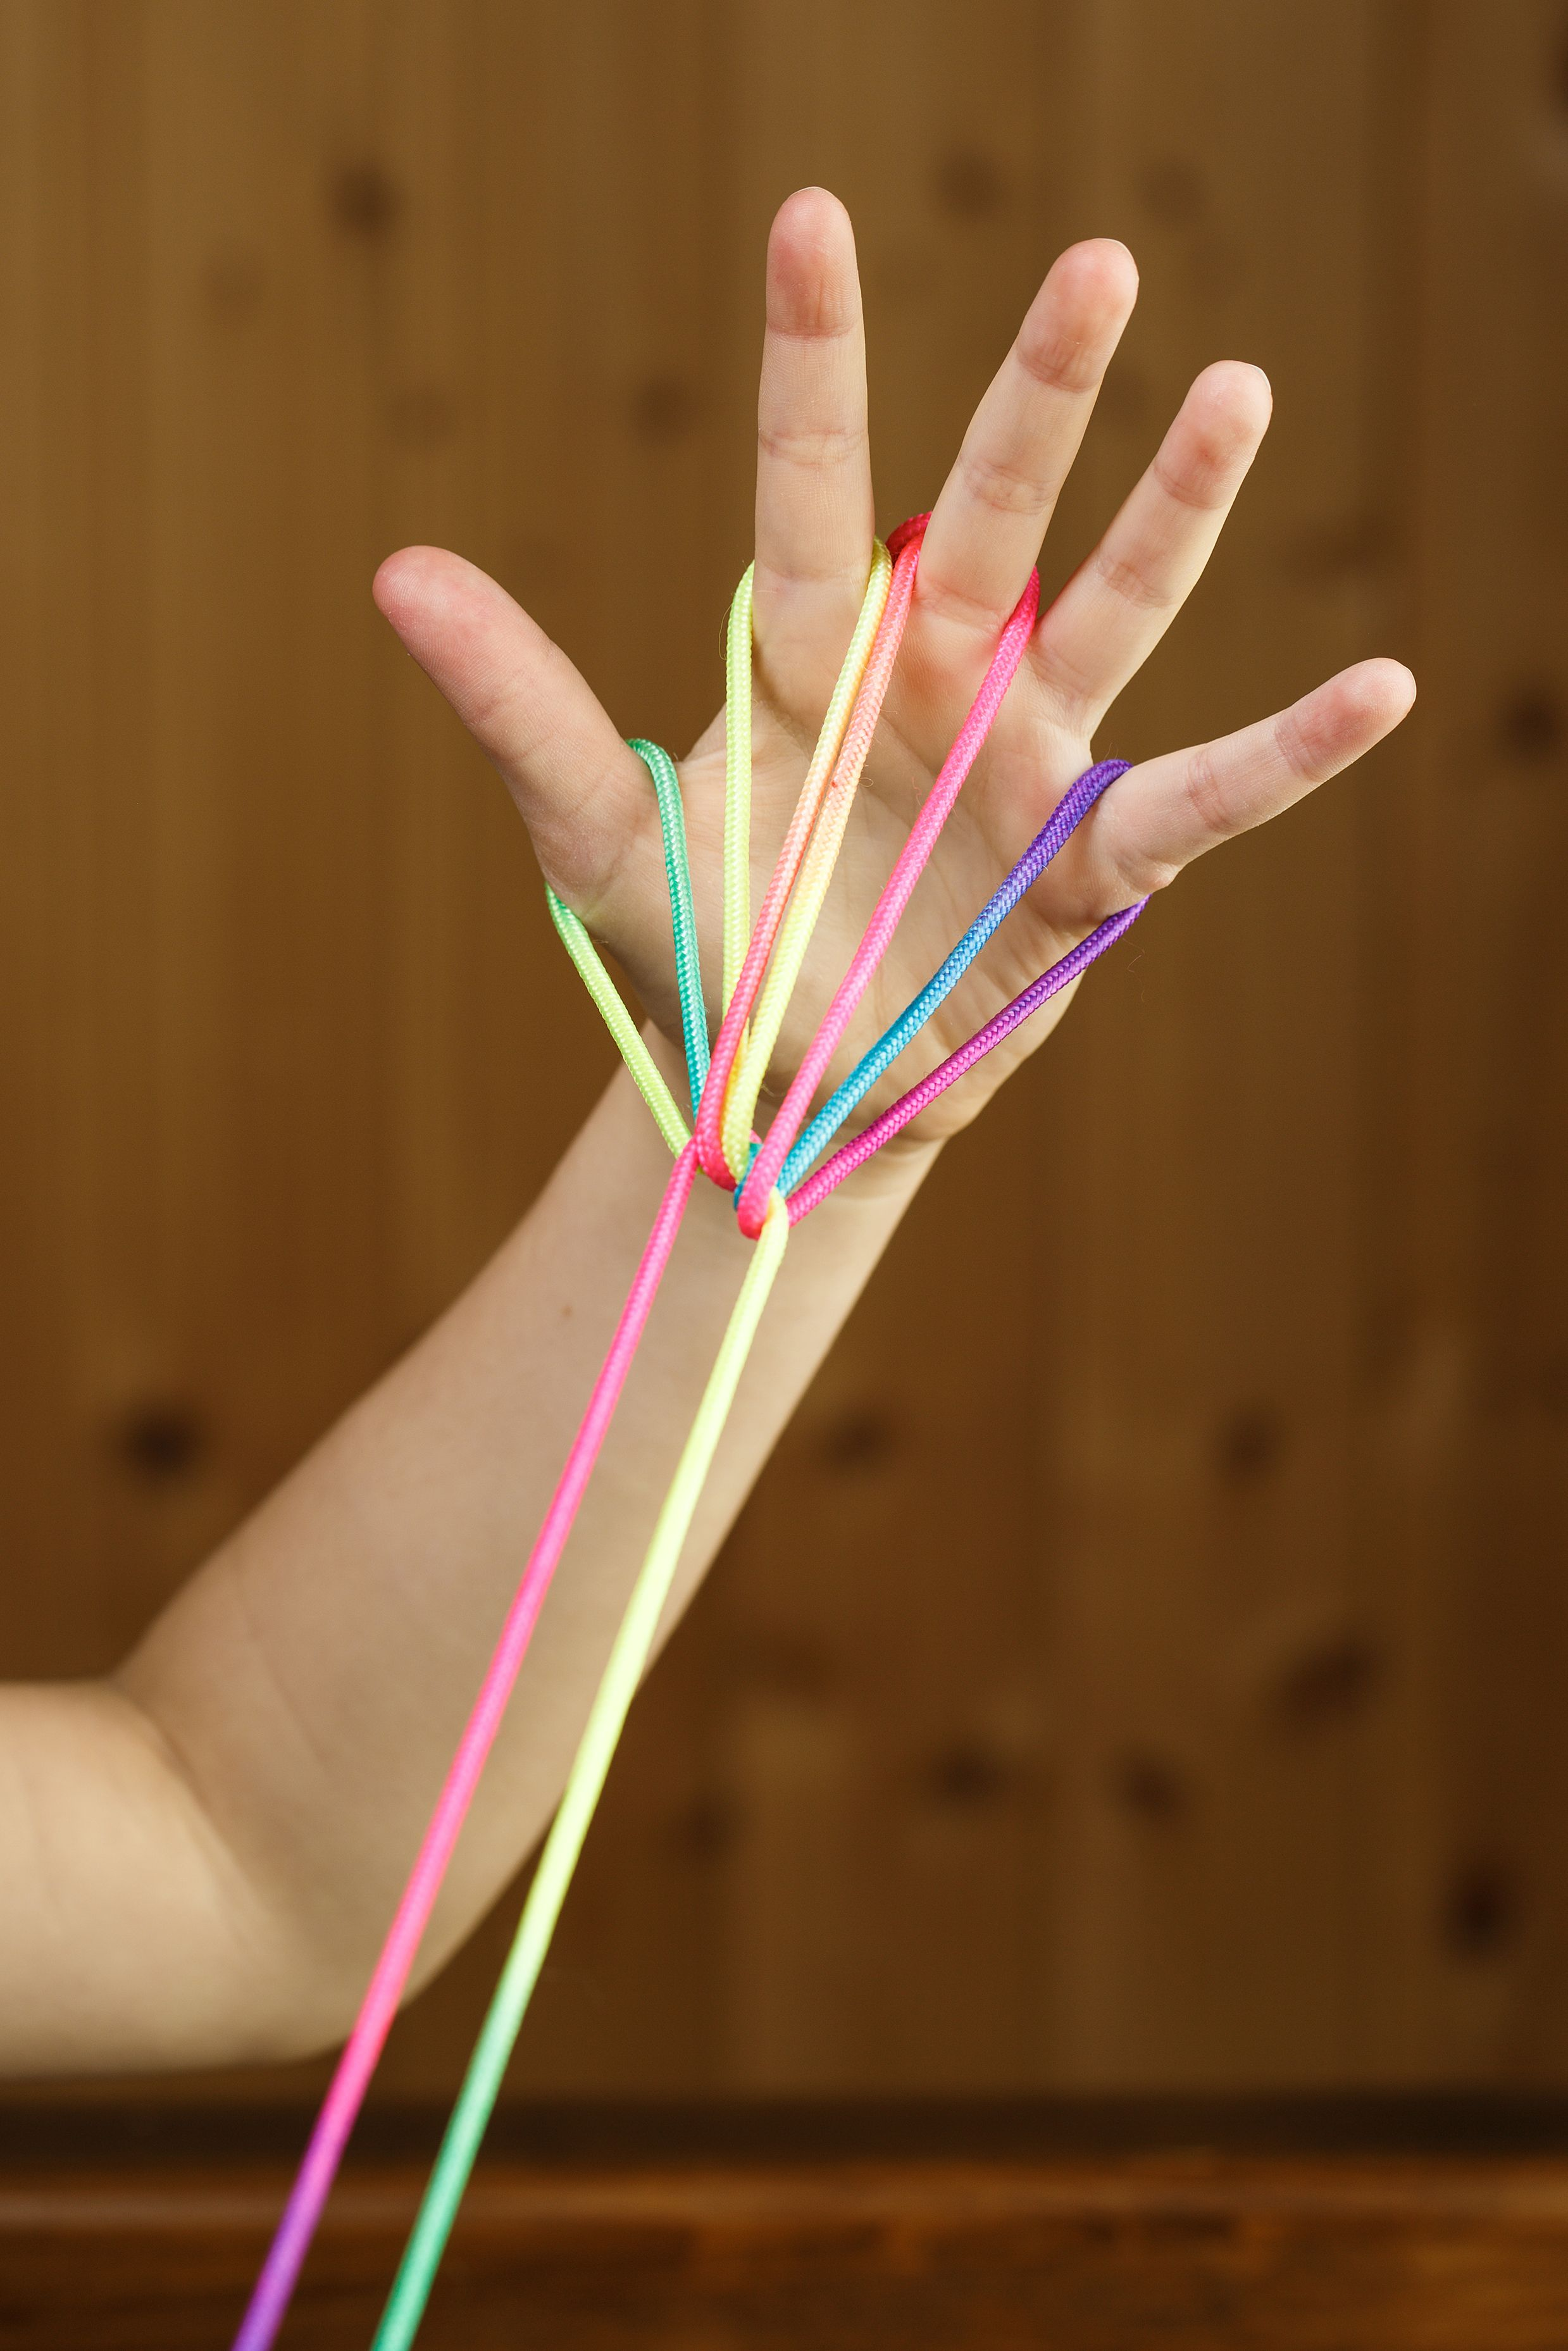 Finger Strings Kipp Brothers Diy crafts and hobbies